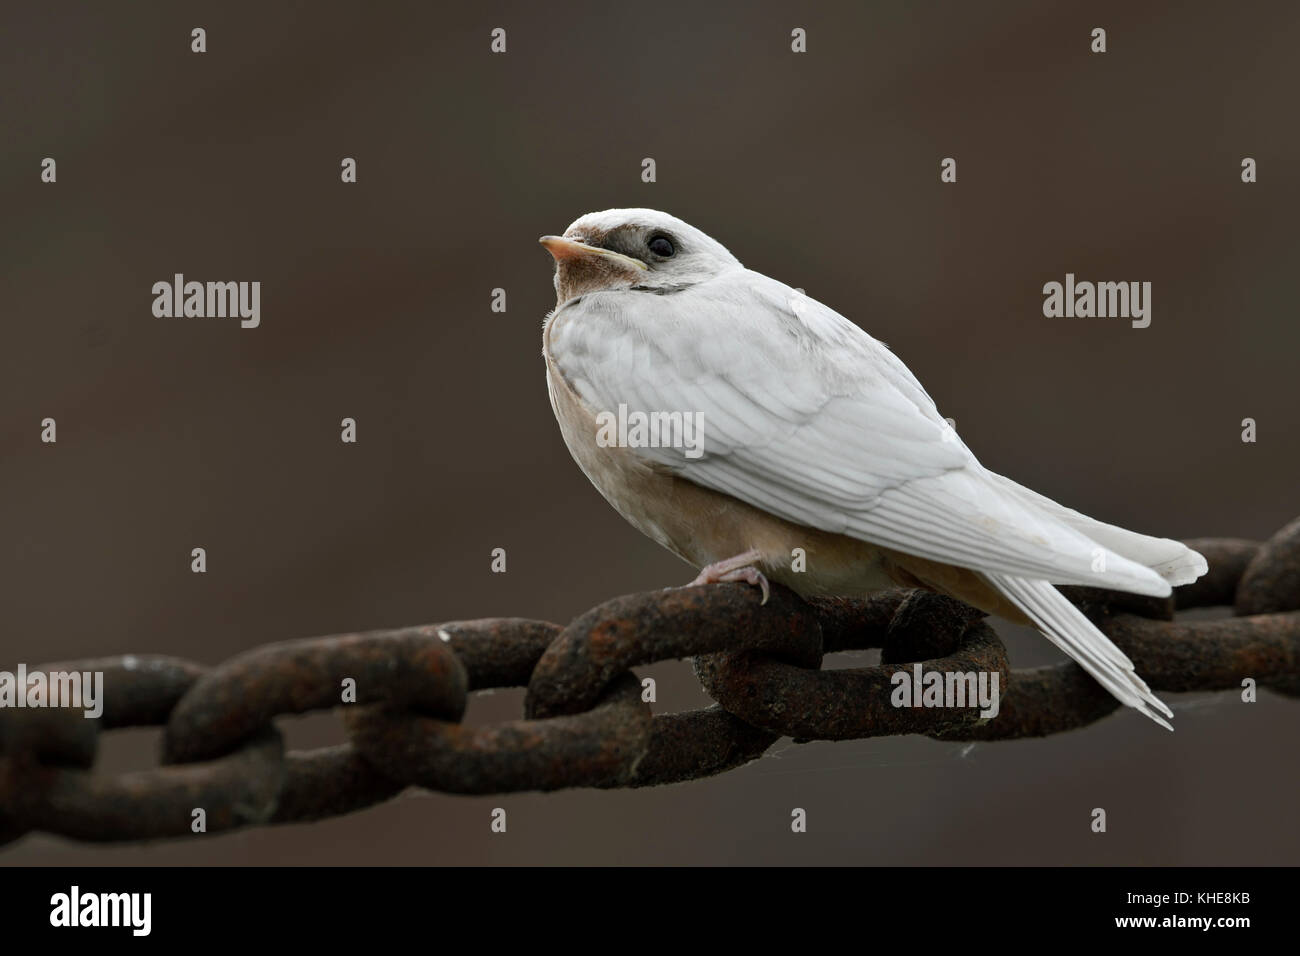 Barn Swallow ( Hirundo rustica ), young, pigment defect, white plumage, leucistic, leucism, perched on a massive - Stock Image